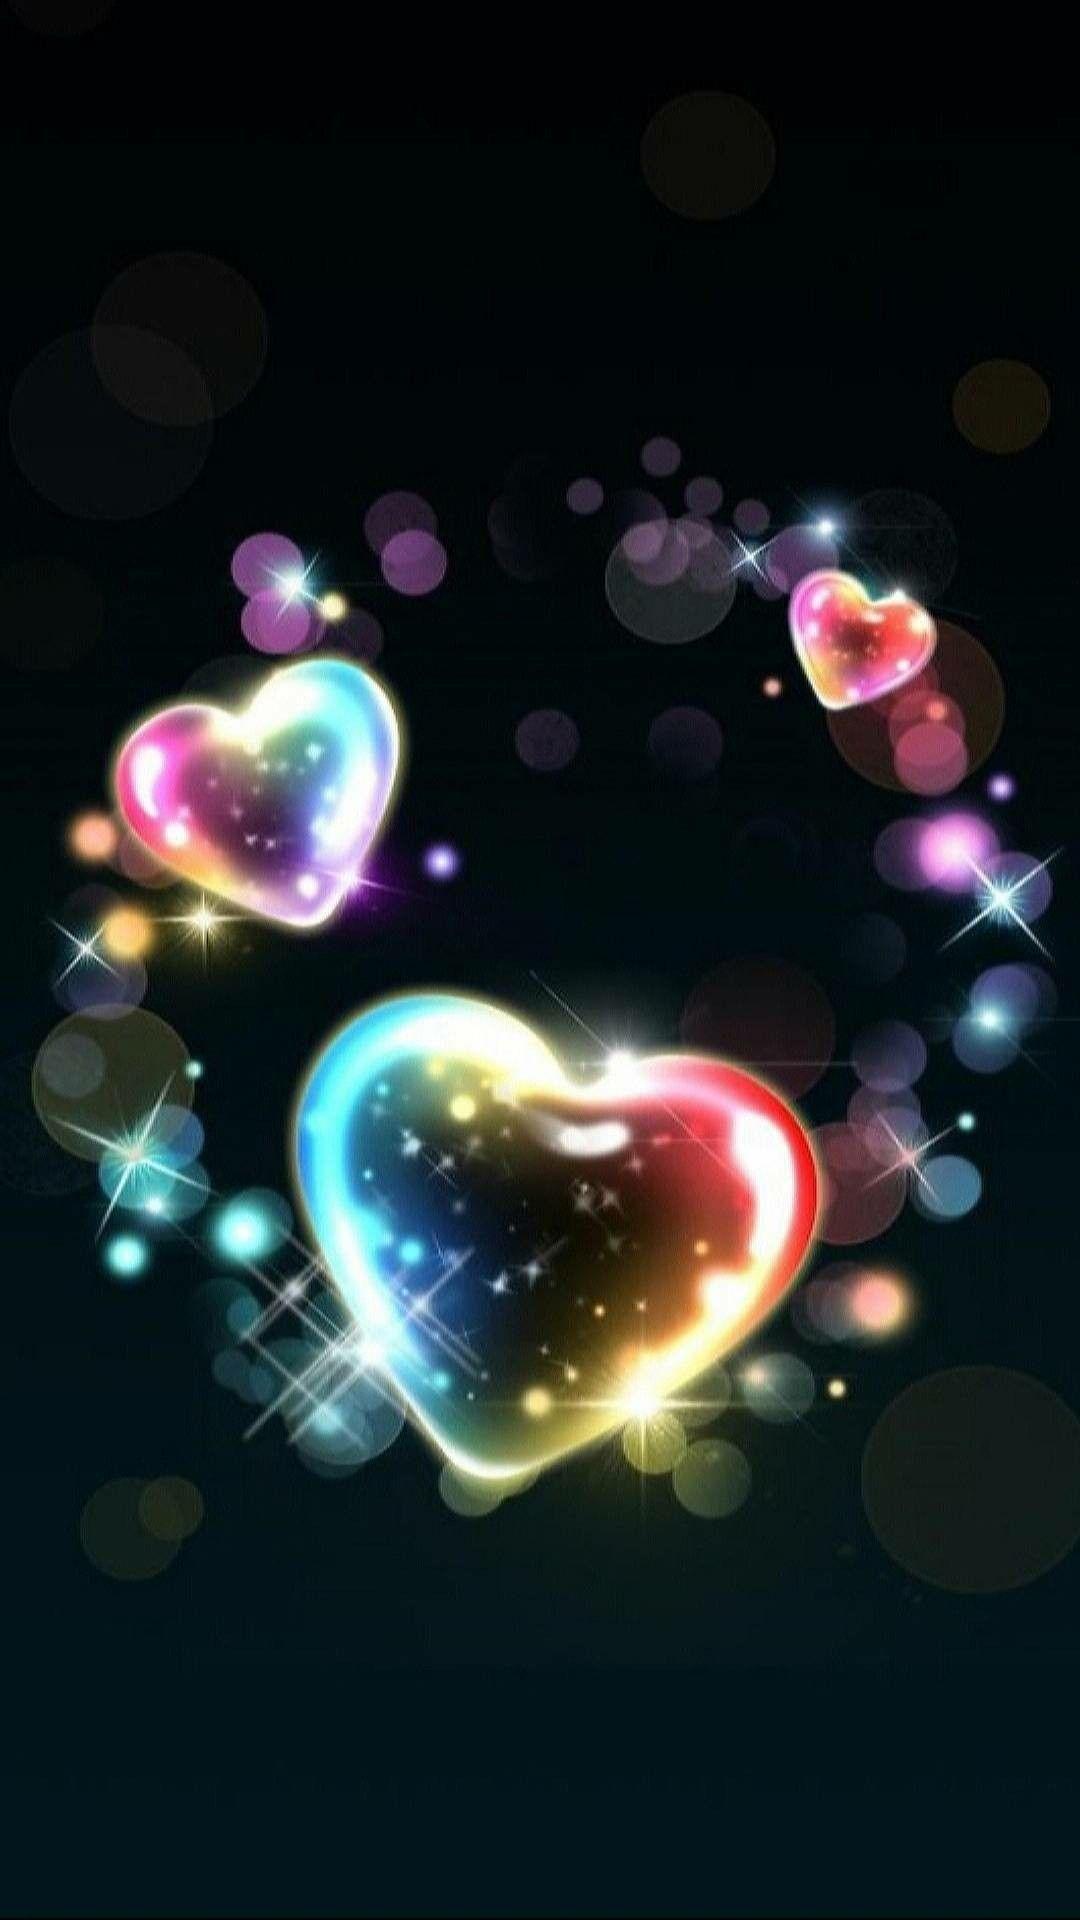 Hearts Made Of Bubbles Heart Wallpaper Hd Heart Iphone Wallpaper Heart Wallpaper